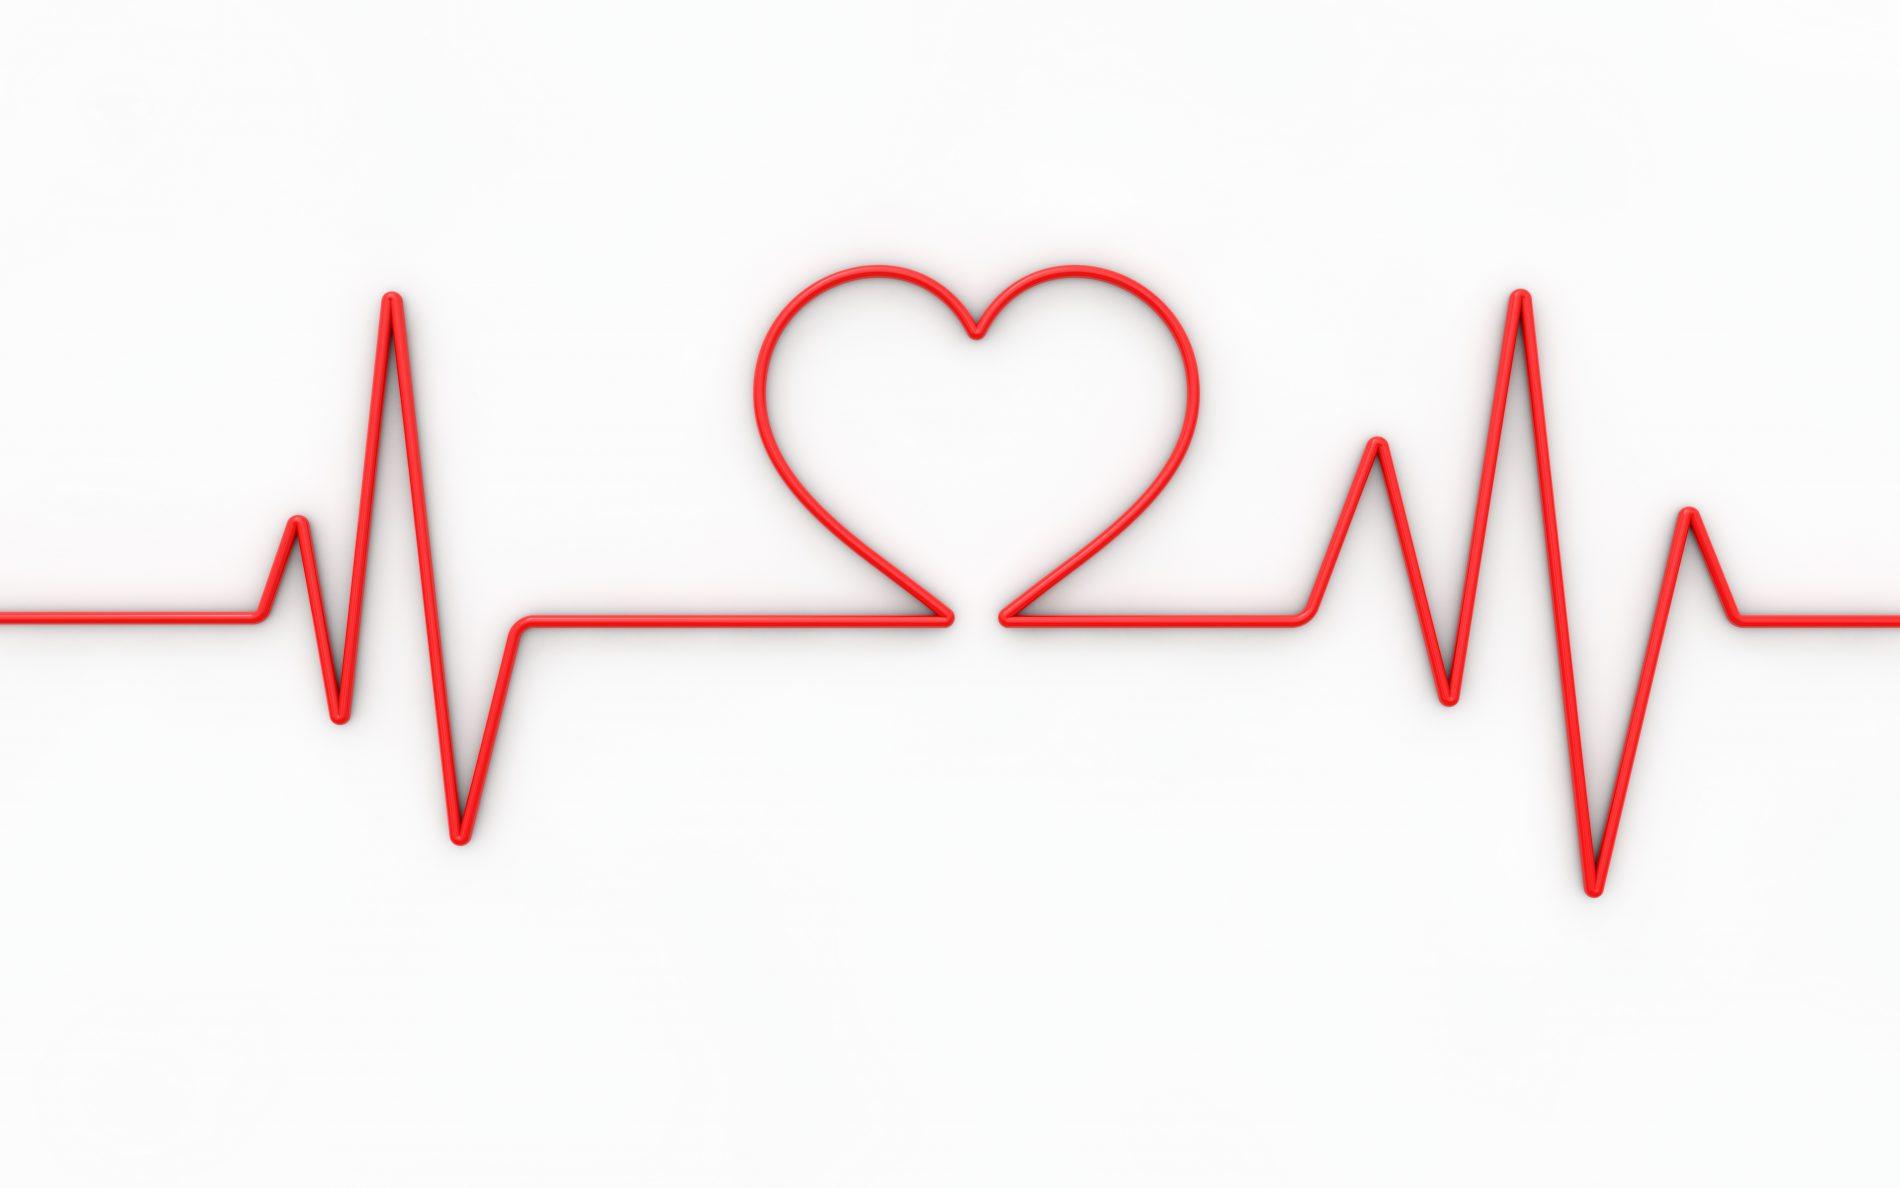 Proteina C reattiva: patologie cardiache